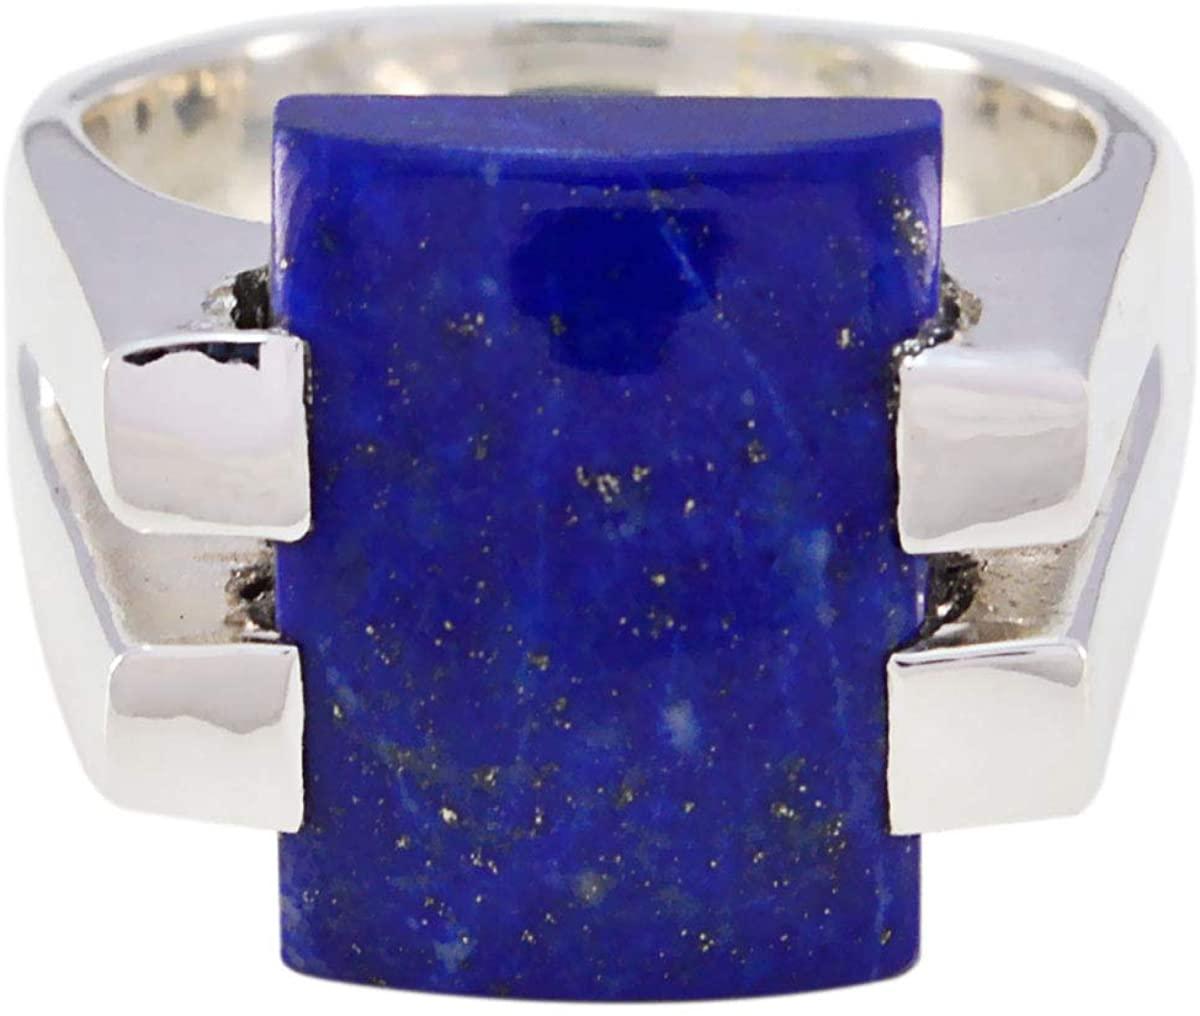 Joyas Plata Nice Gemstone Octagon Shape One Stone Cabochon Lapis Lazuli ring-Sterling Silver Blue Lapis Lazuli Ring-October Birth Libra Astrology Nice Gemstone Ring SRLLACB-6091-4 us